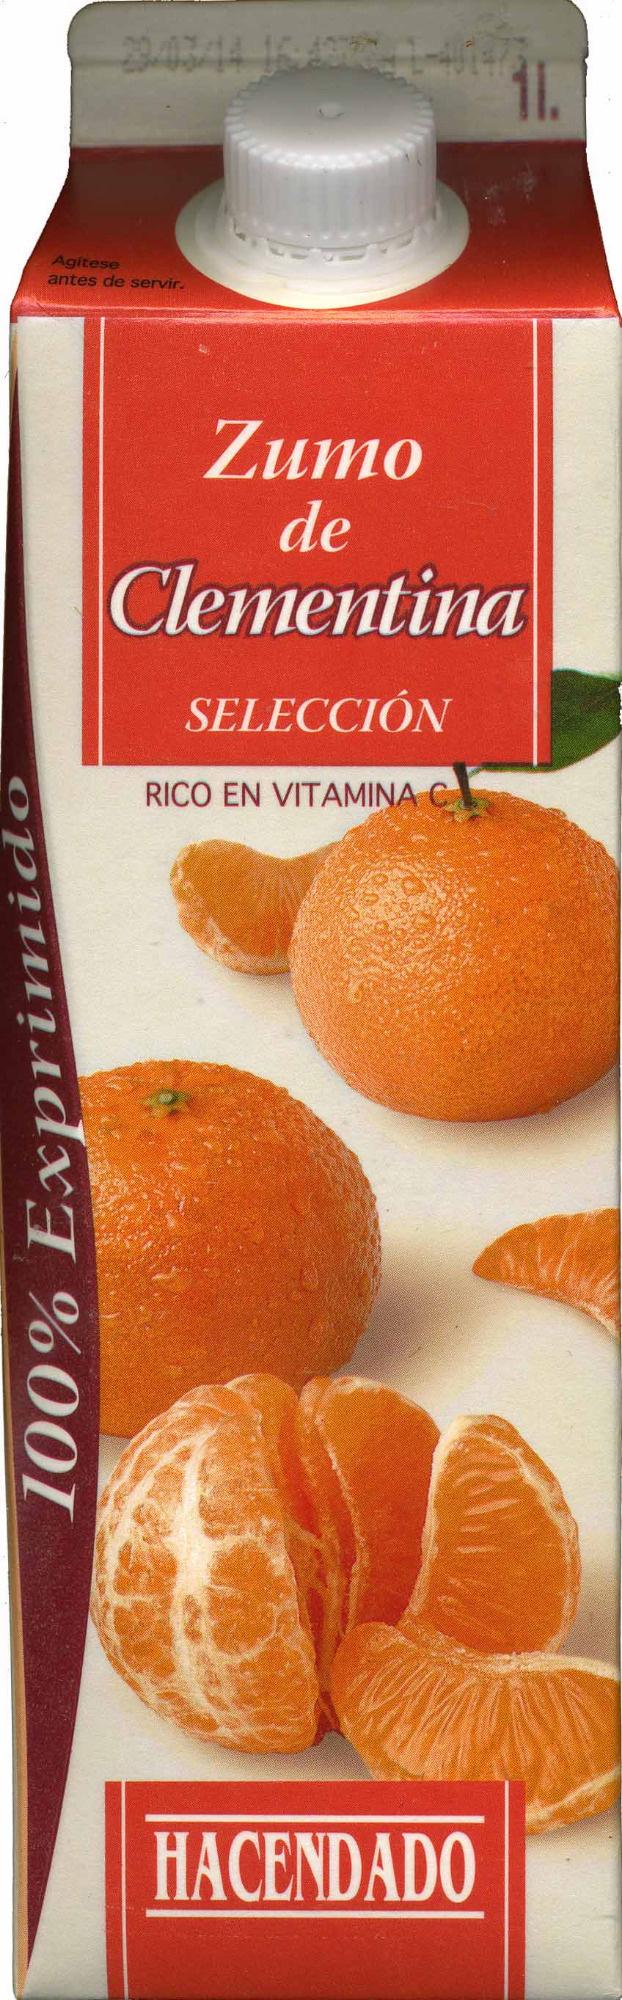 Zumo de clementina - Product